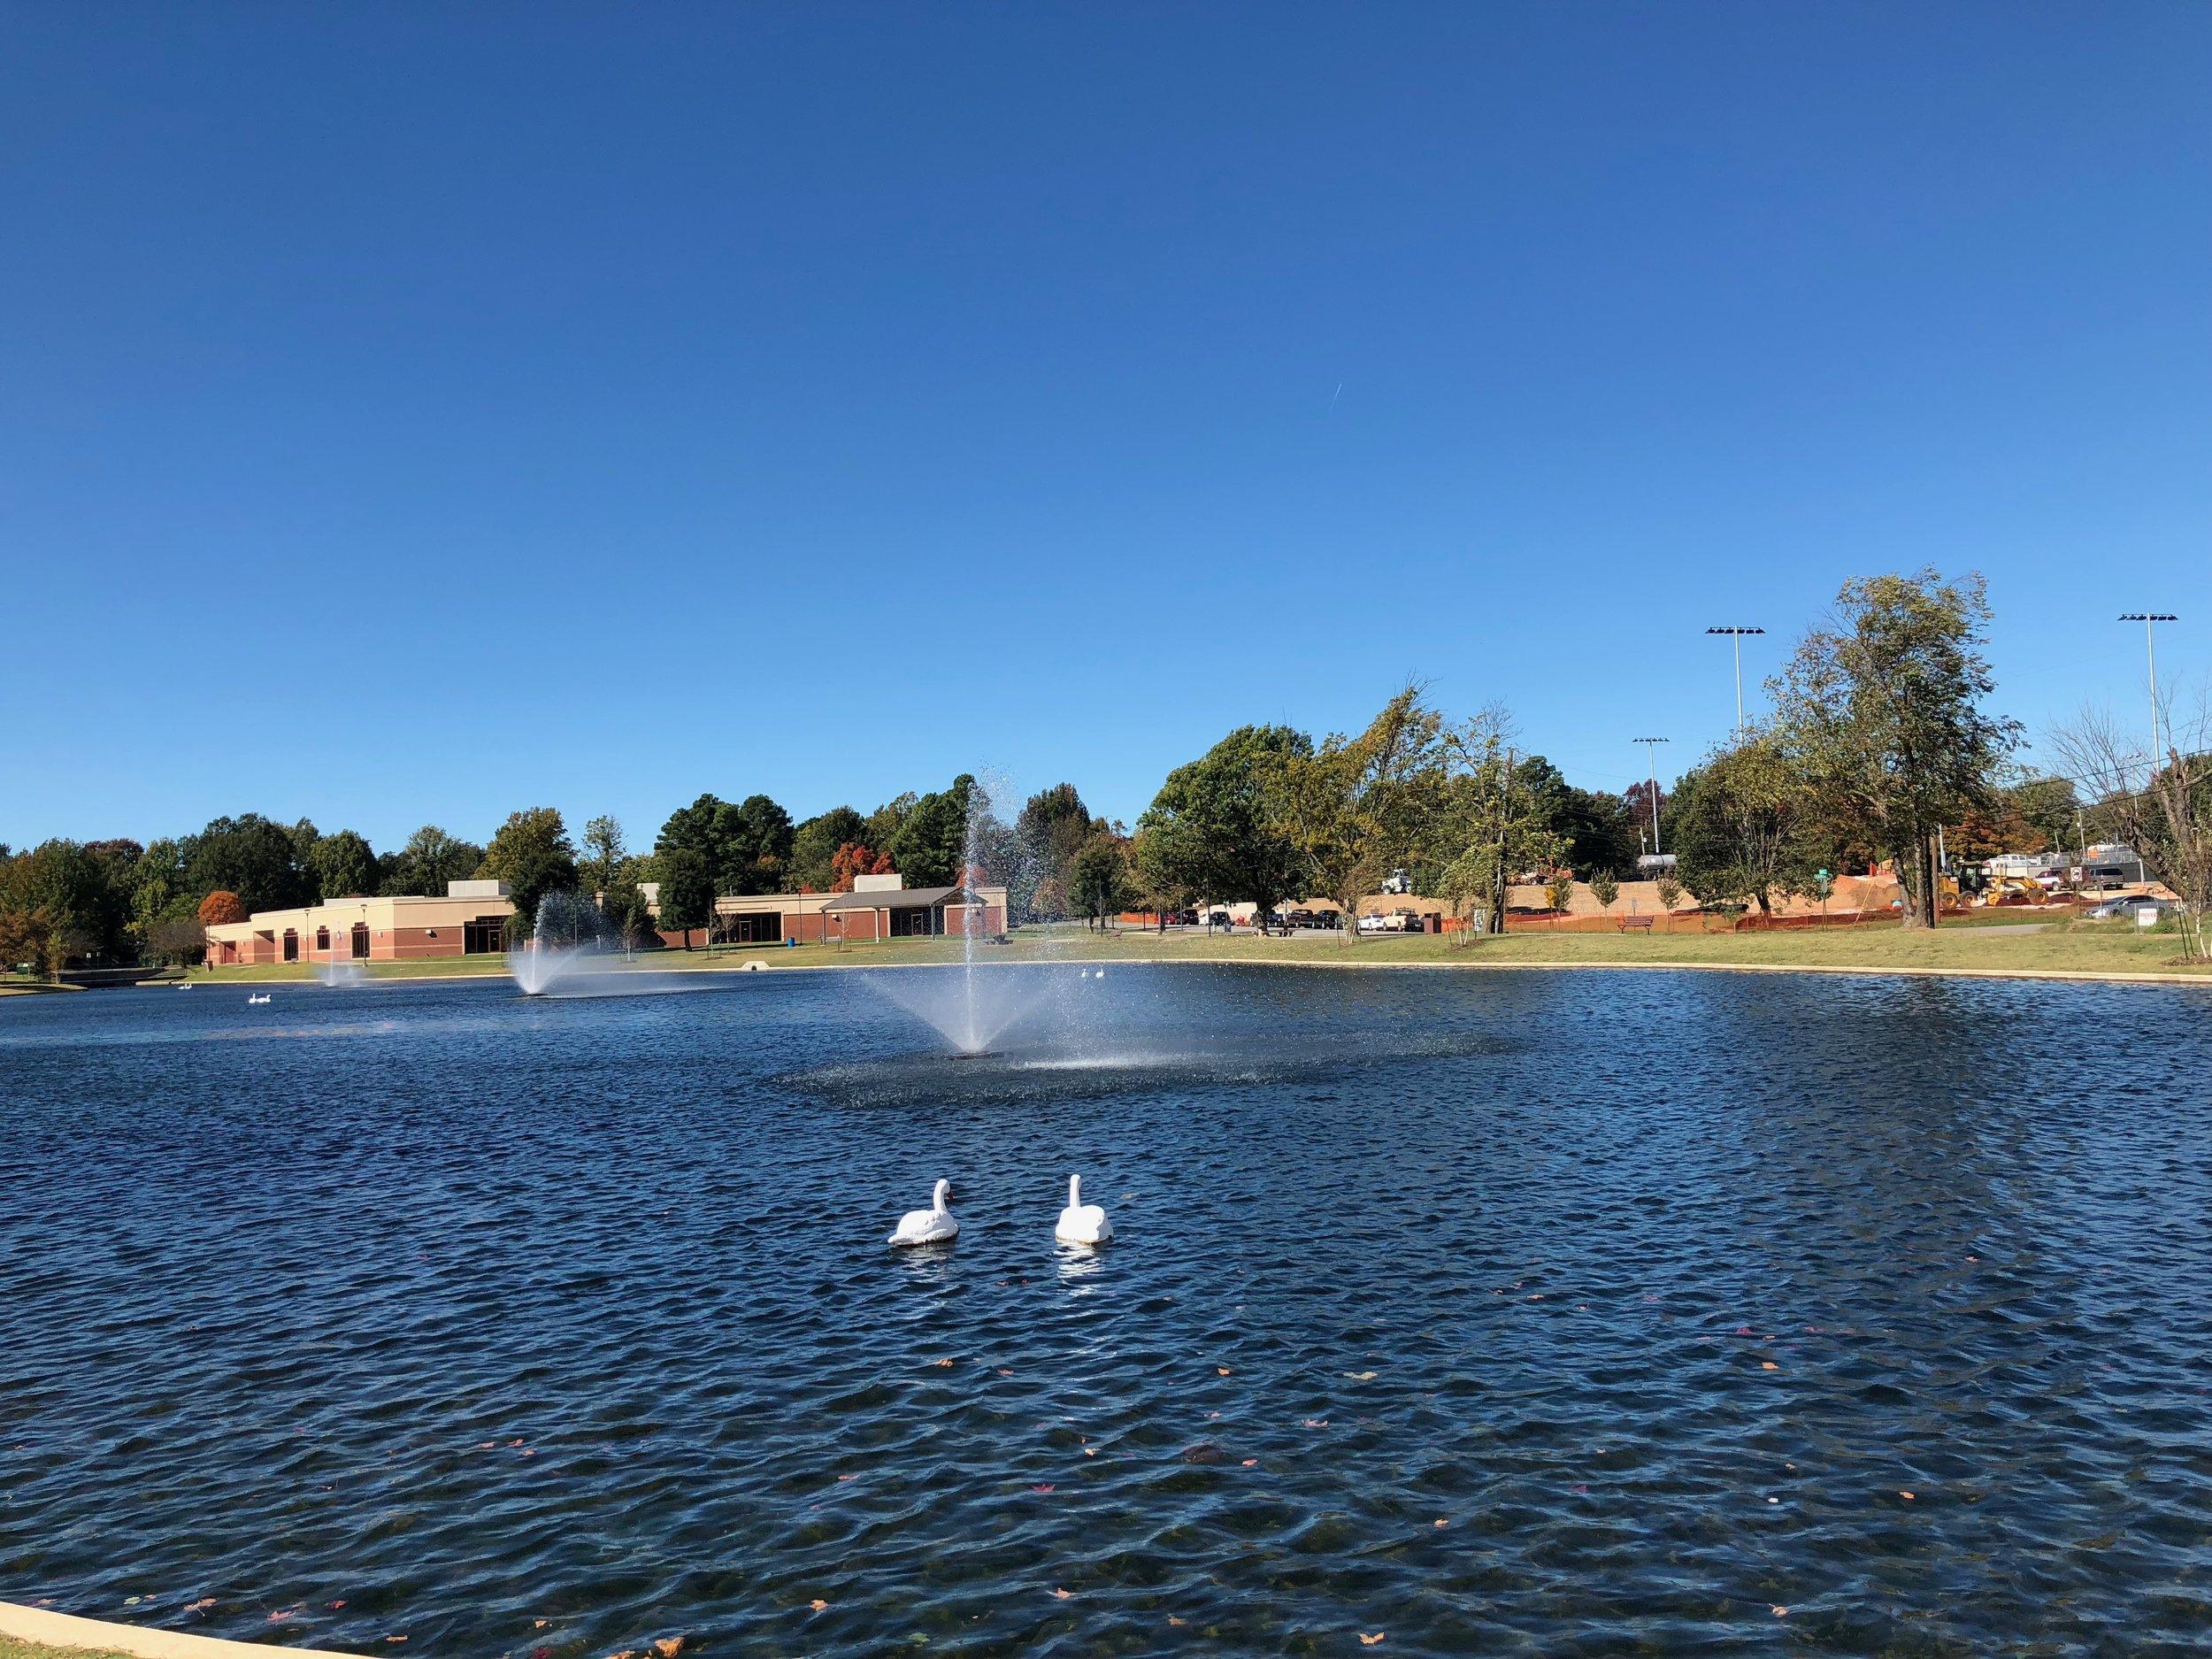 View toward Springdale Public Library